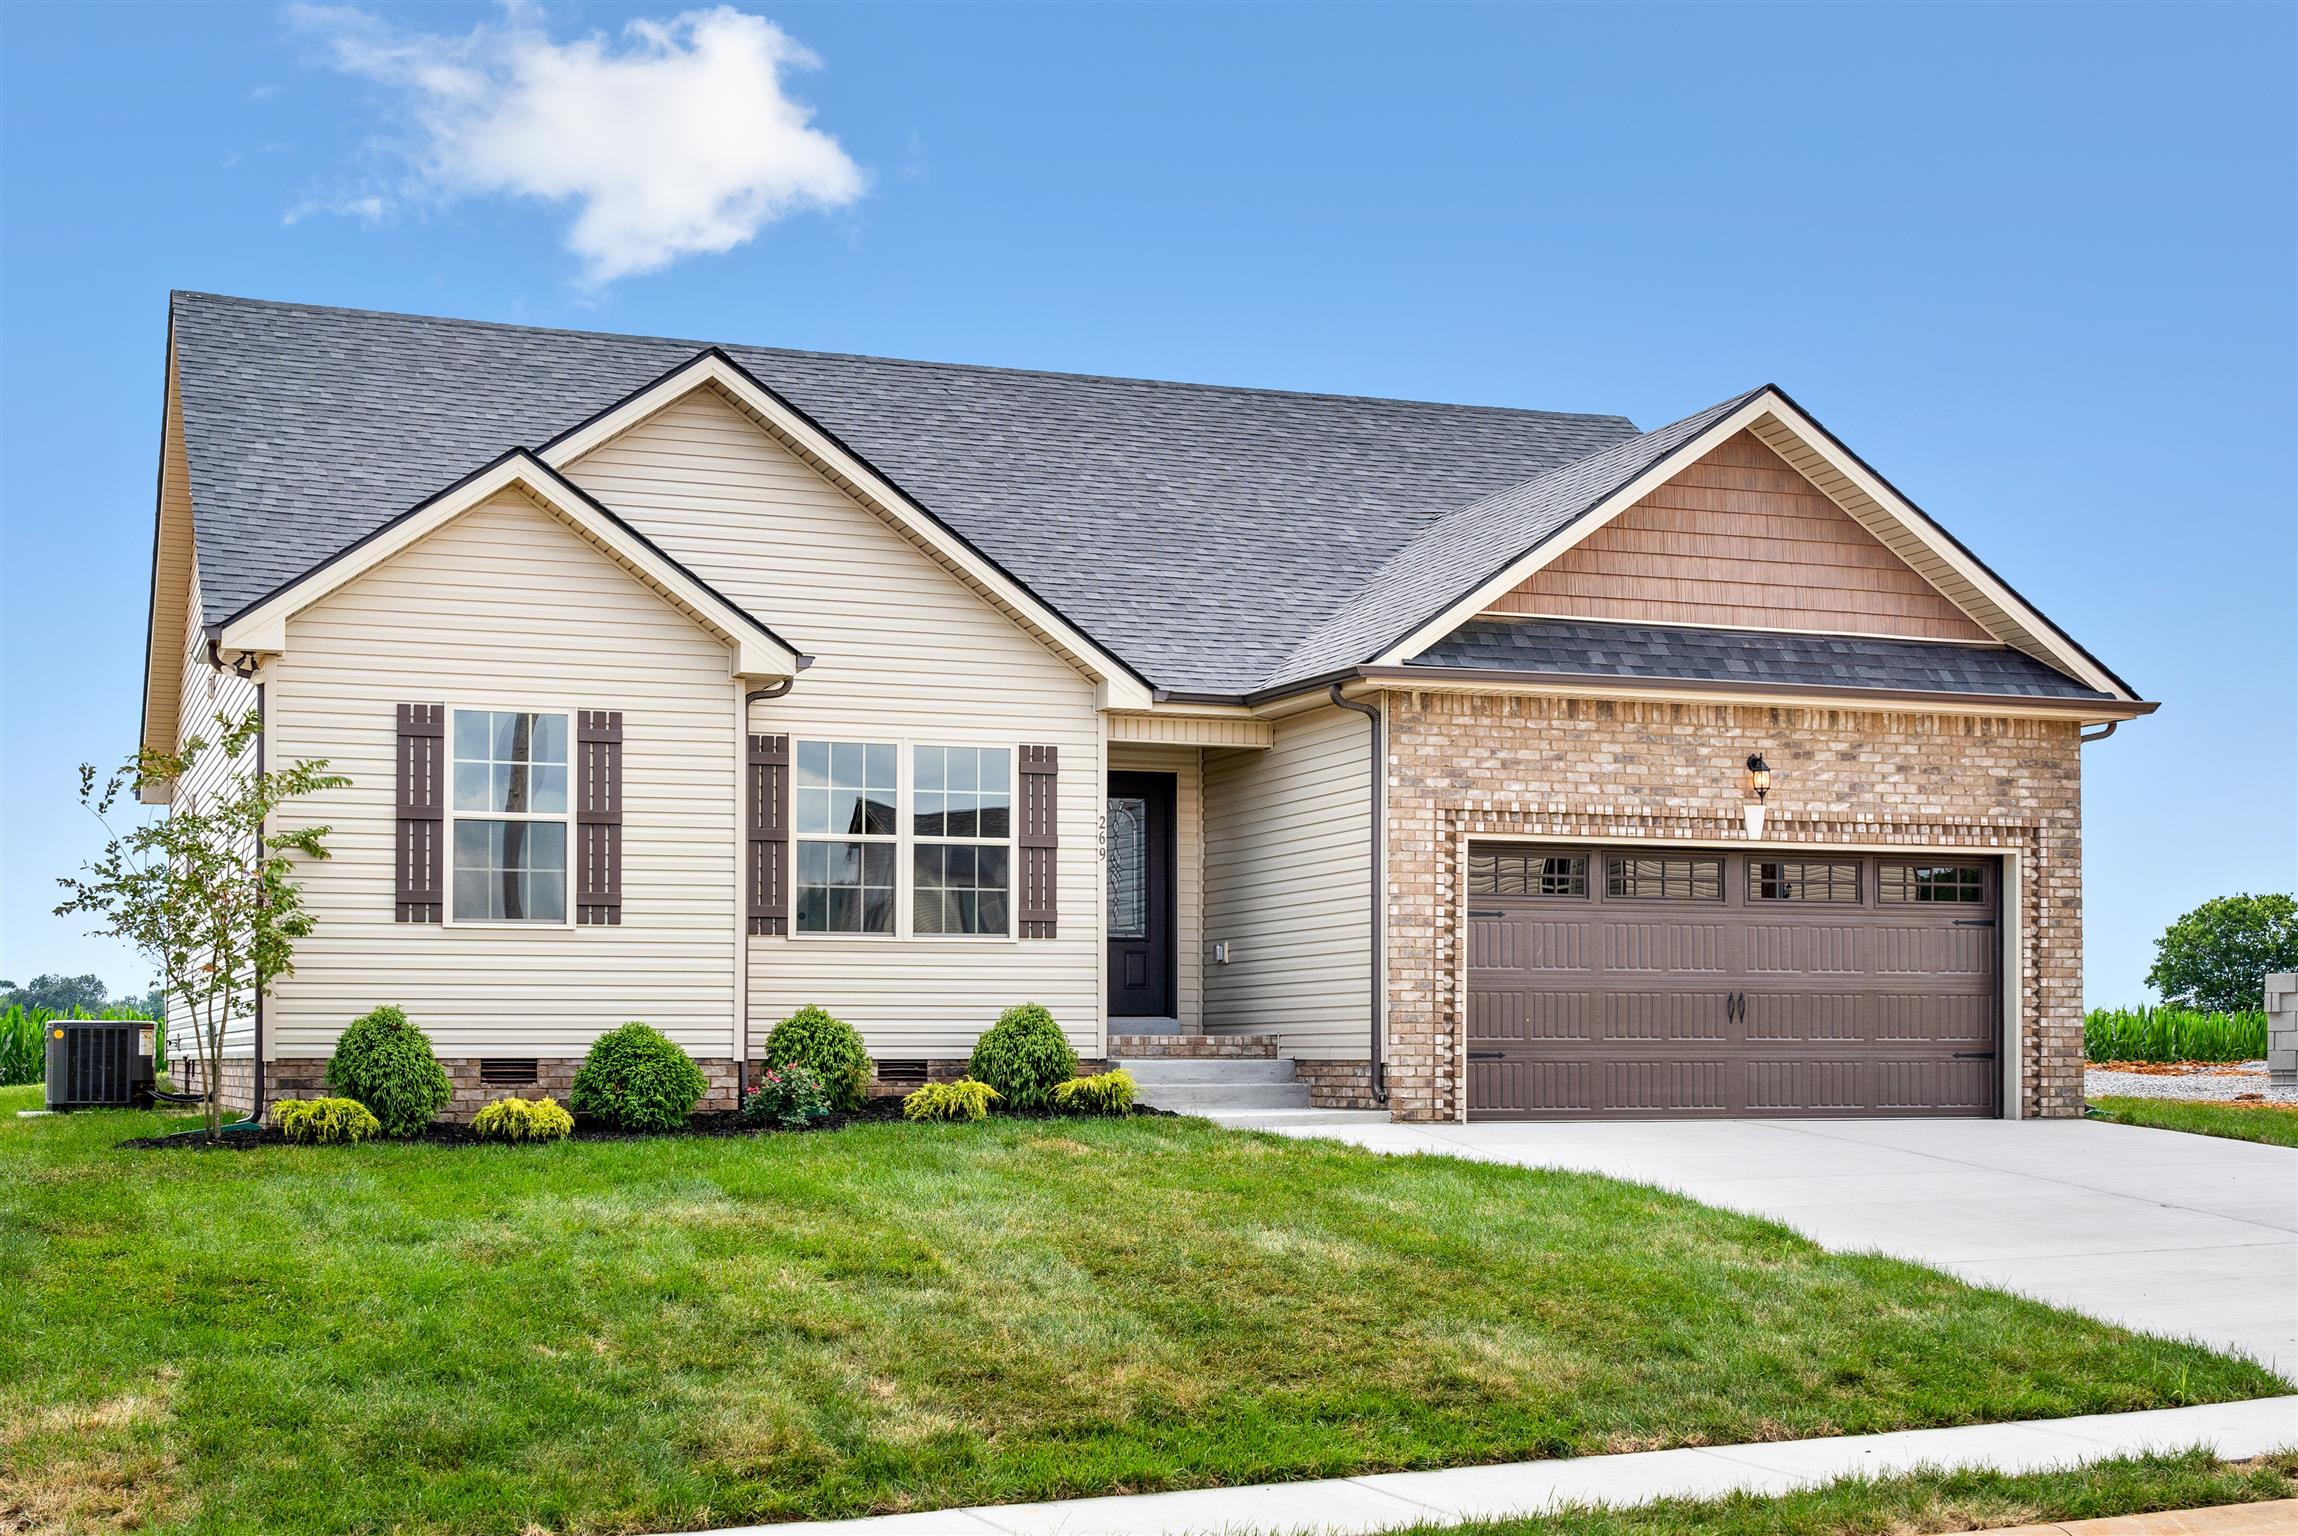 269 Azalea Drive, Oak Grove, KY 42262 - Oak Grove, KY real estate listing